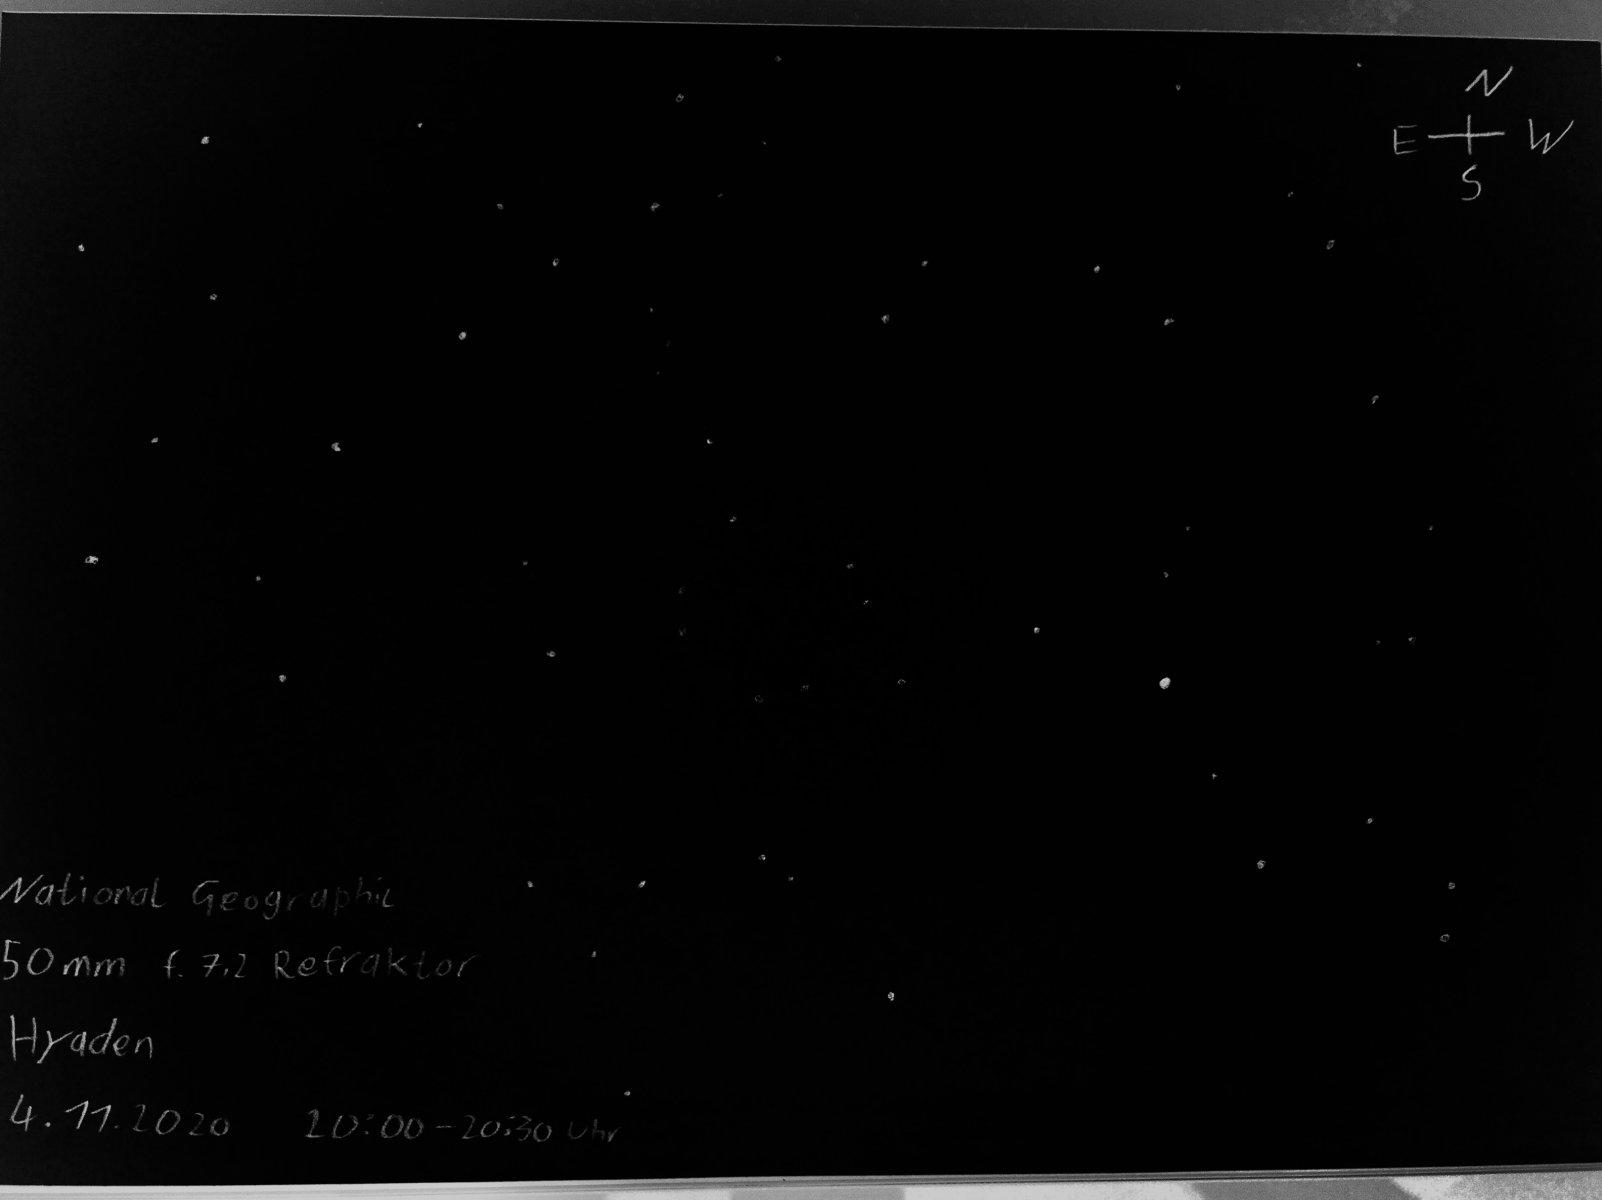 065B99D2-A2CC-49FD-B582-01E5E935B70F.jpeg